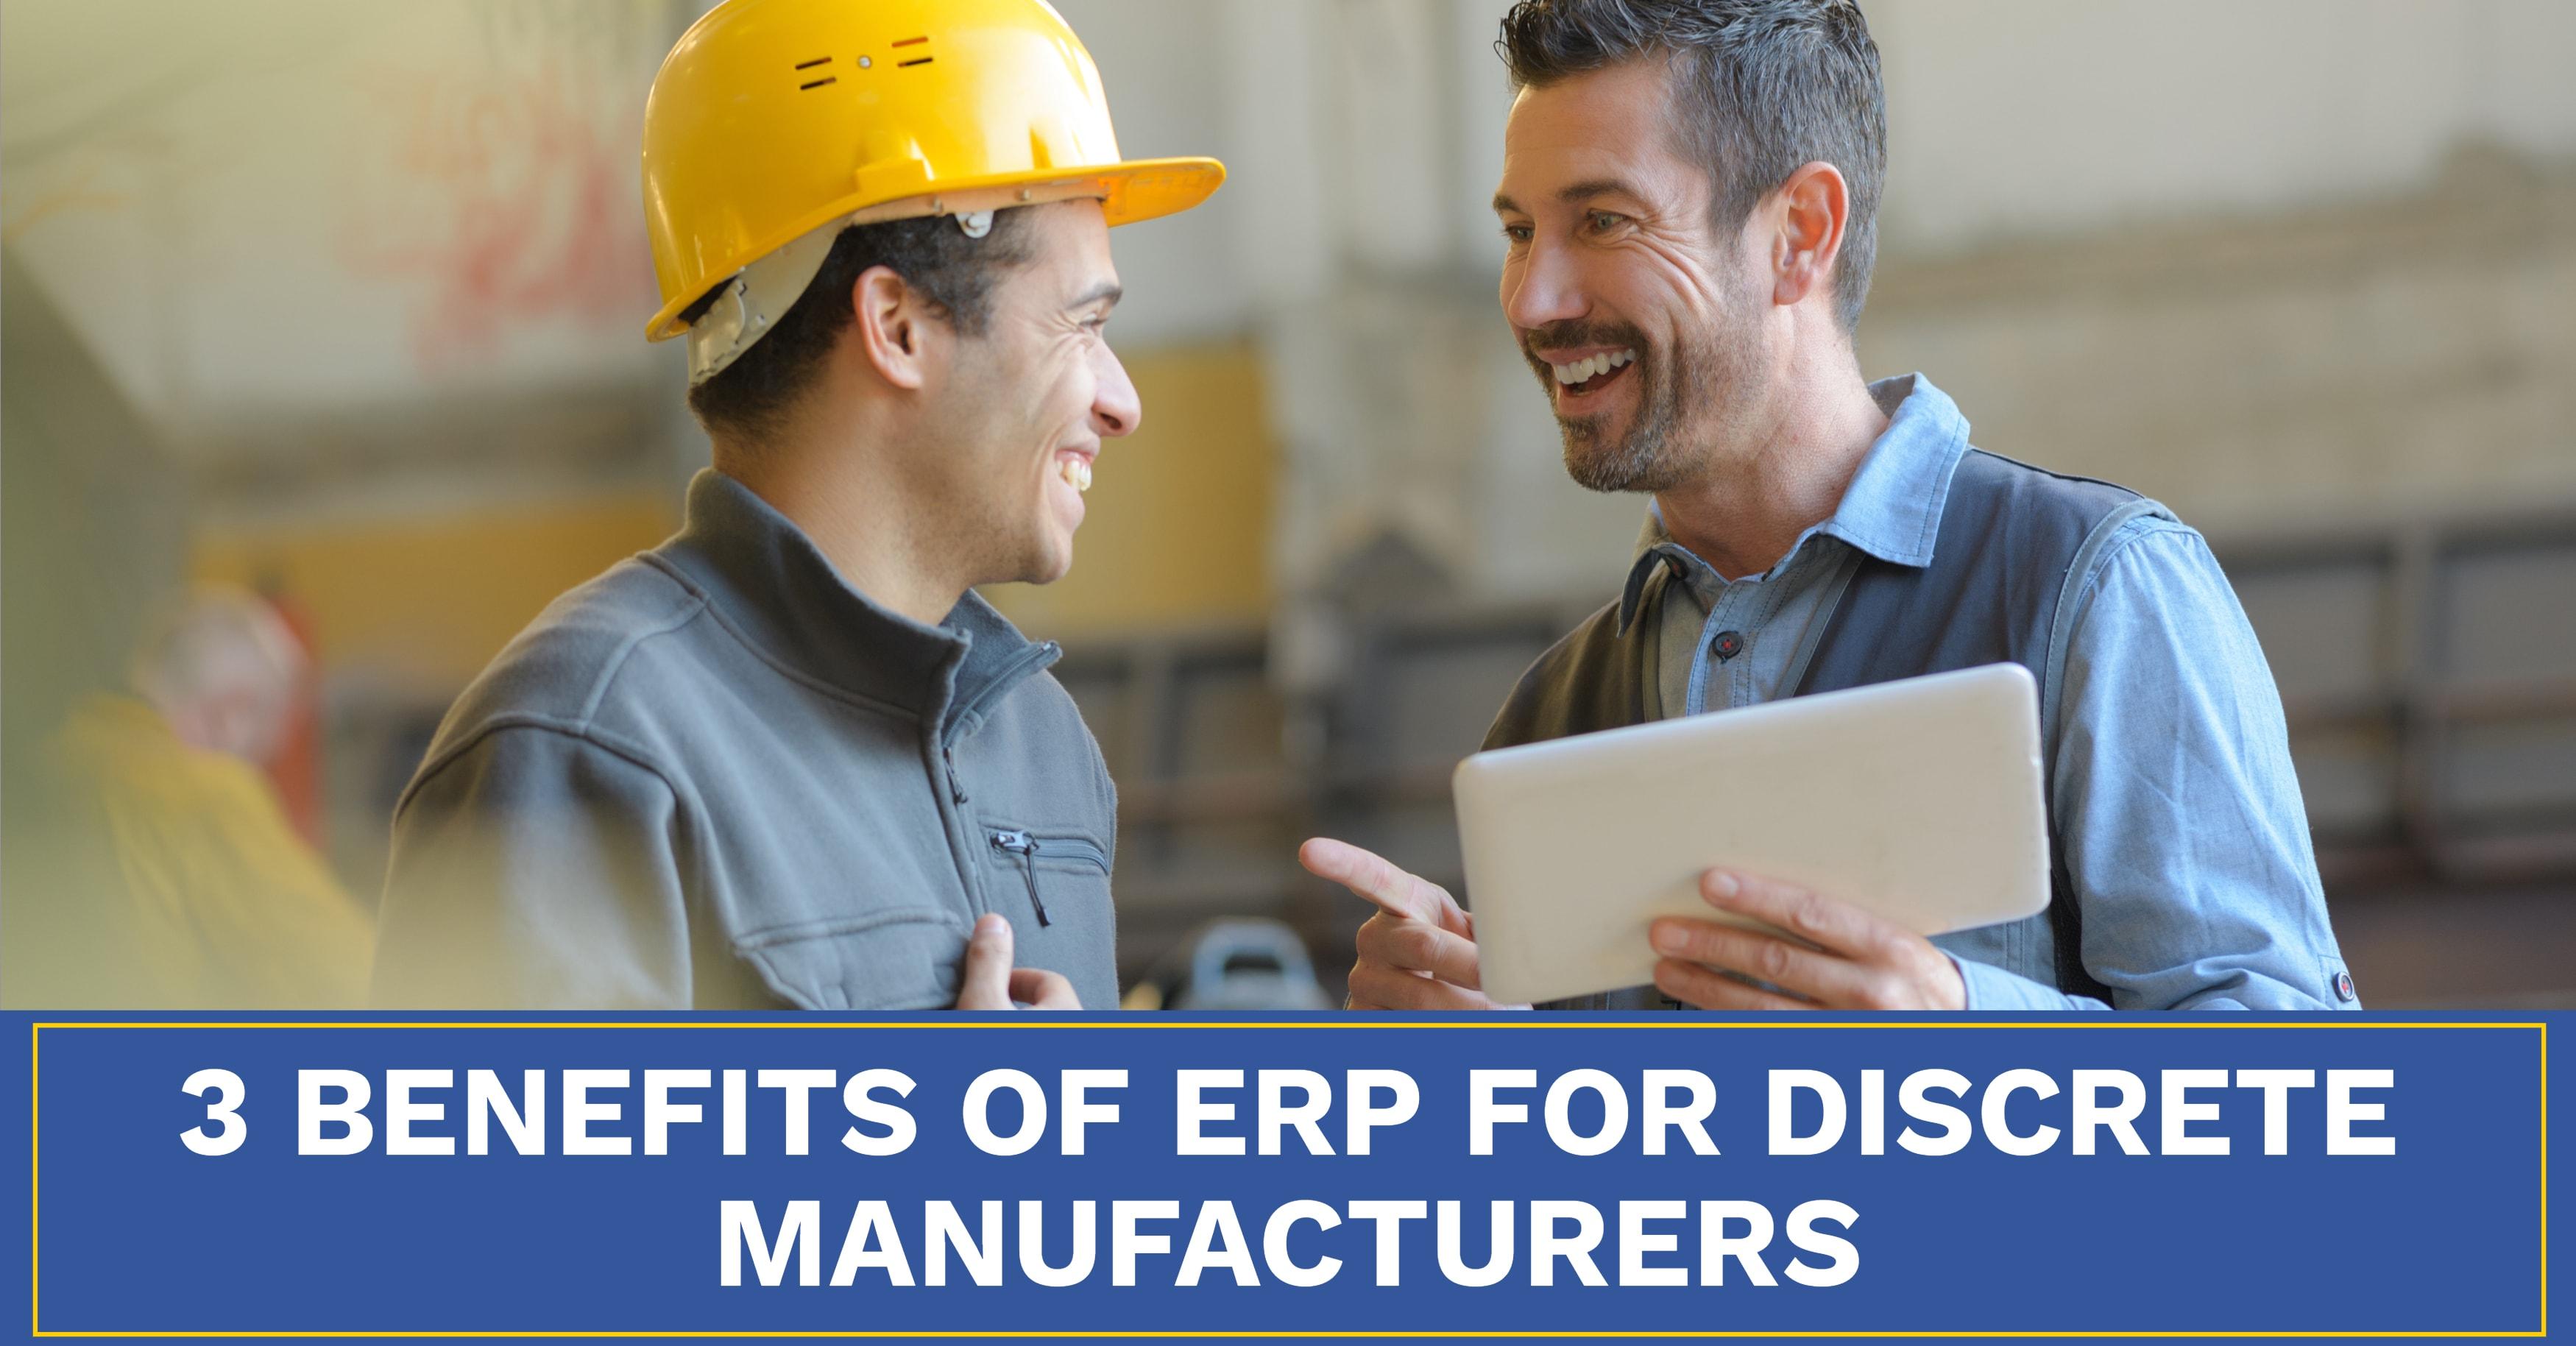 Epicor ERP Discrete Manufacturing